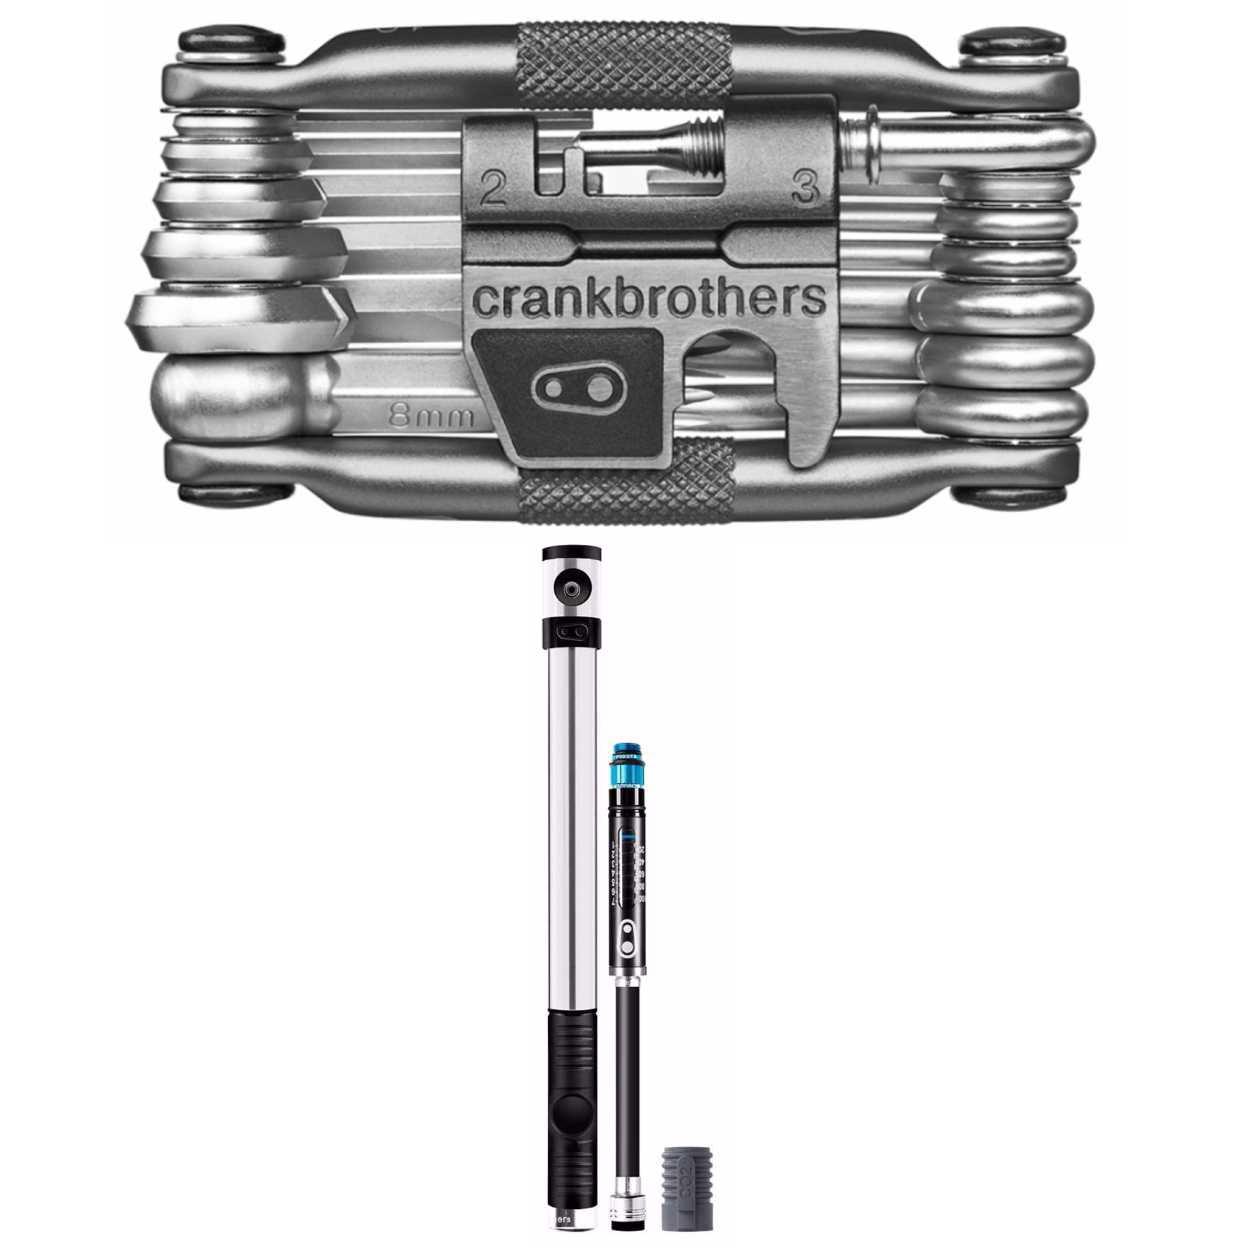 Crank Brothers Klic HP High Pressure Bike Tire Pump and M19 Multi Bicycle Tool